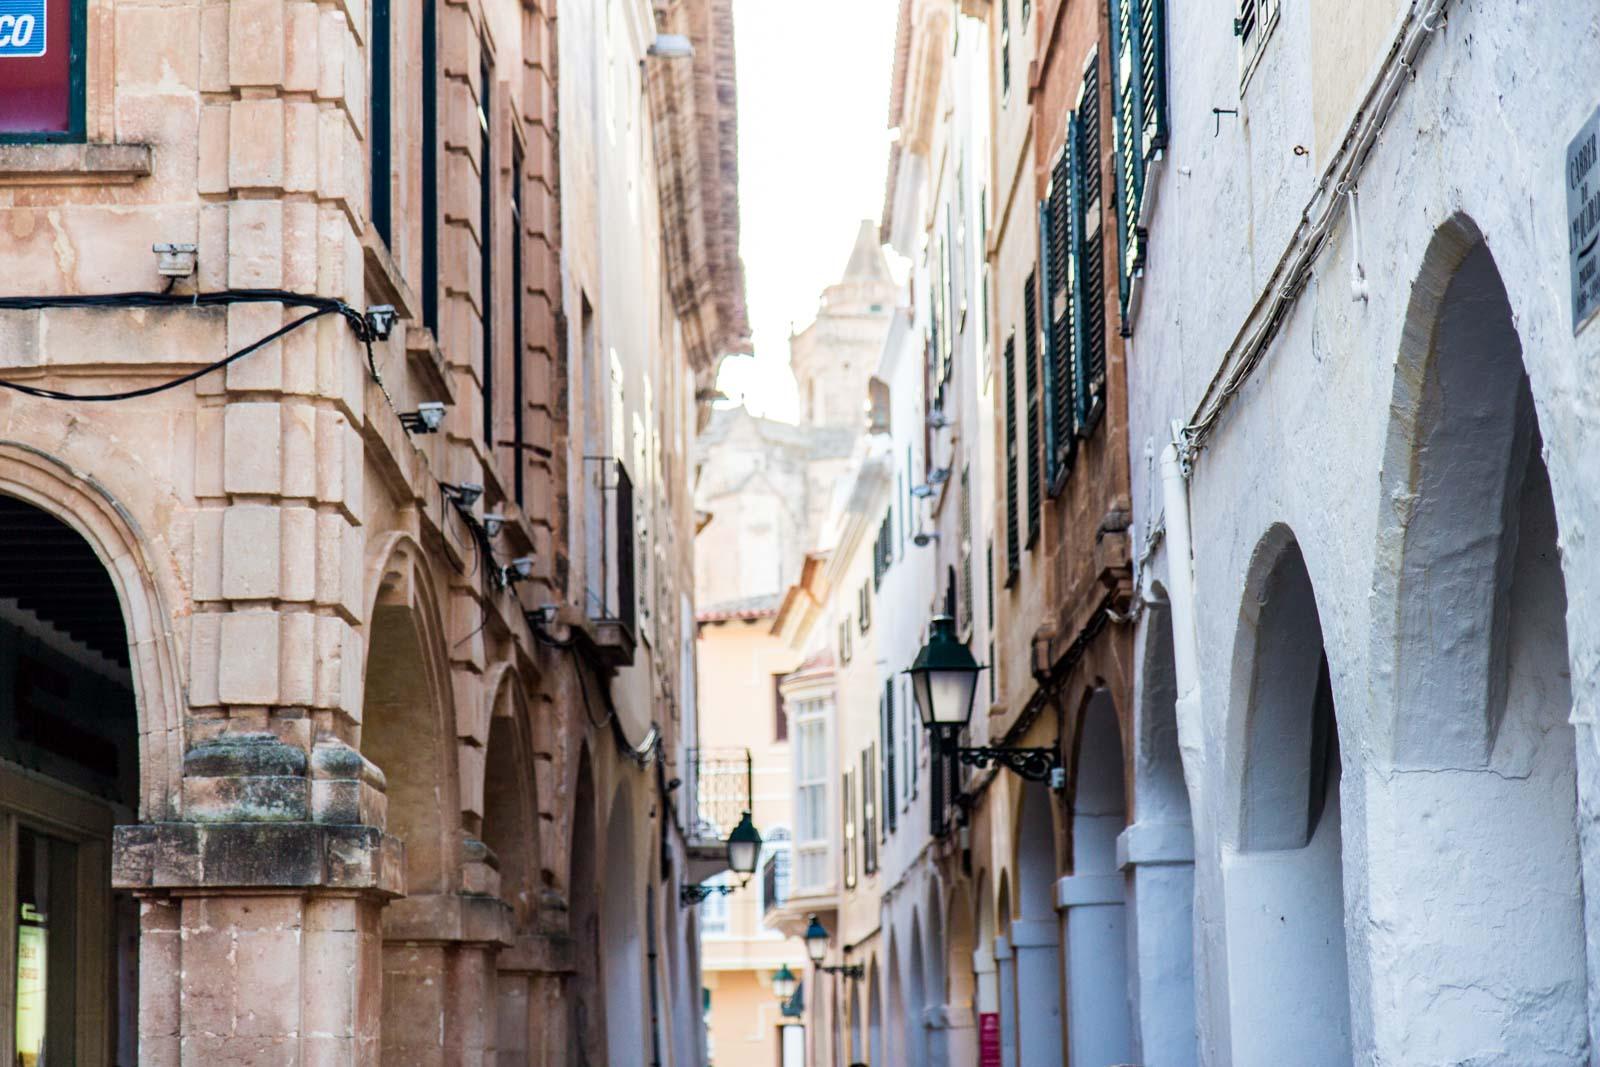 Street photography in Ciutadella, Menorca, Spain